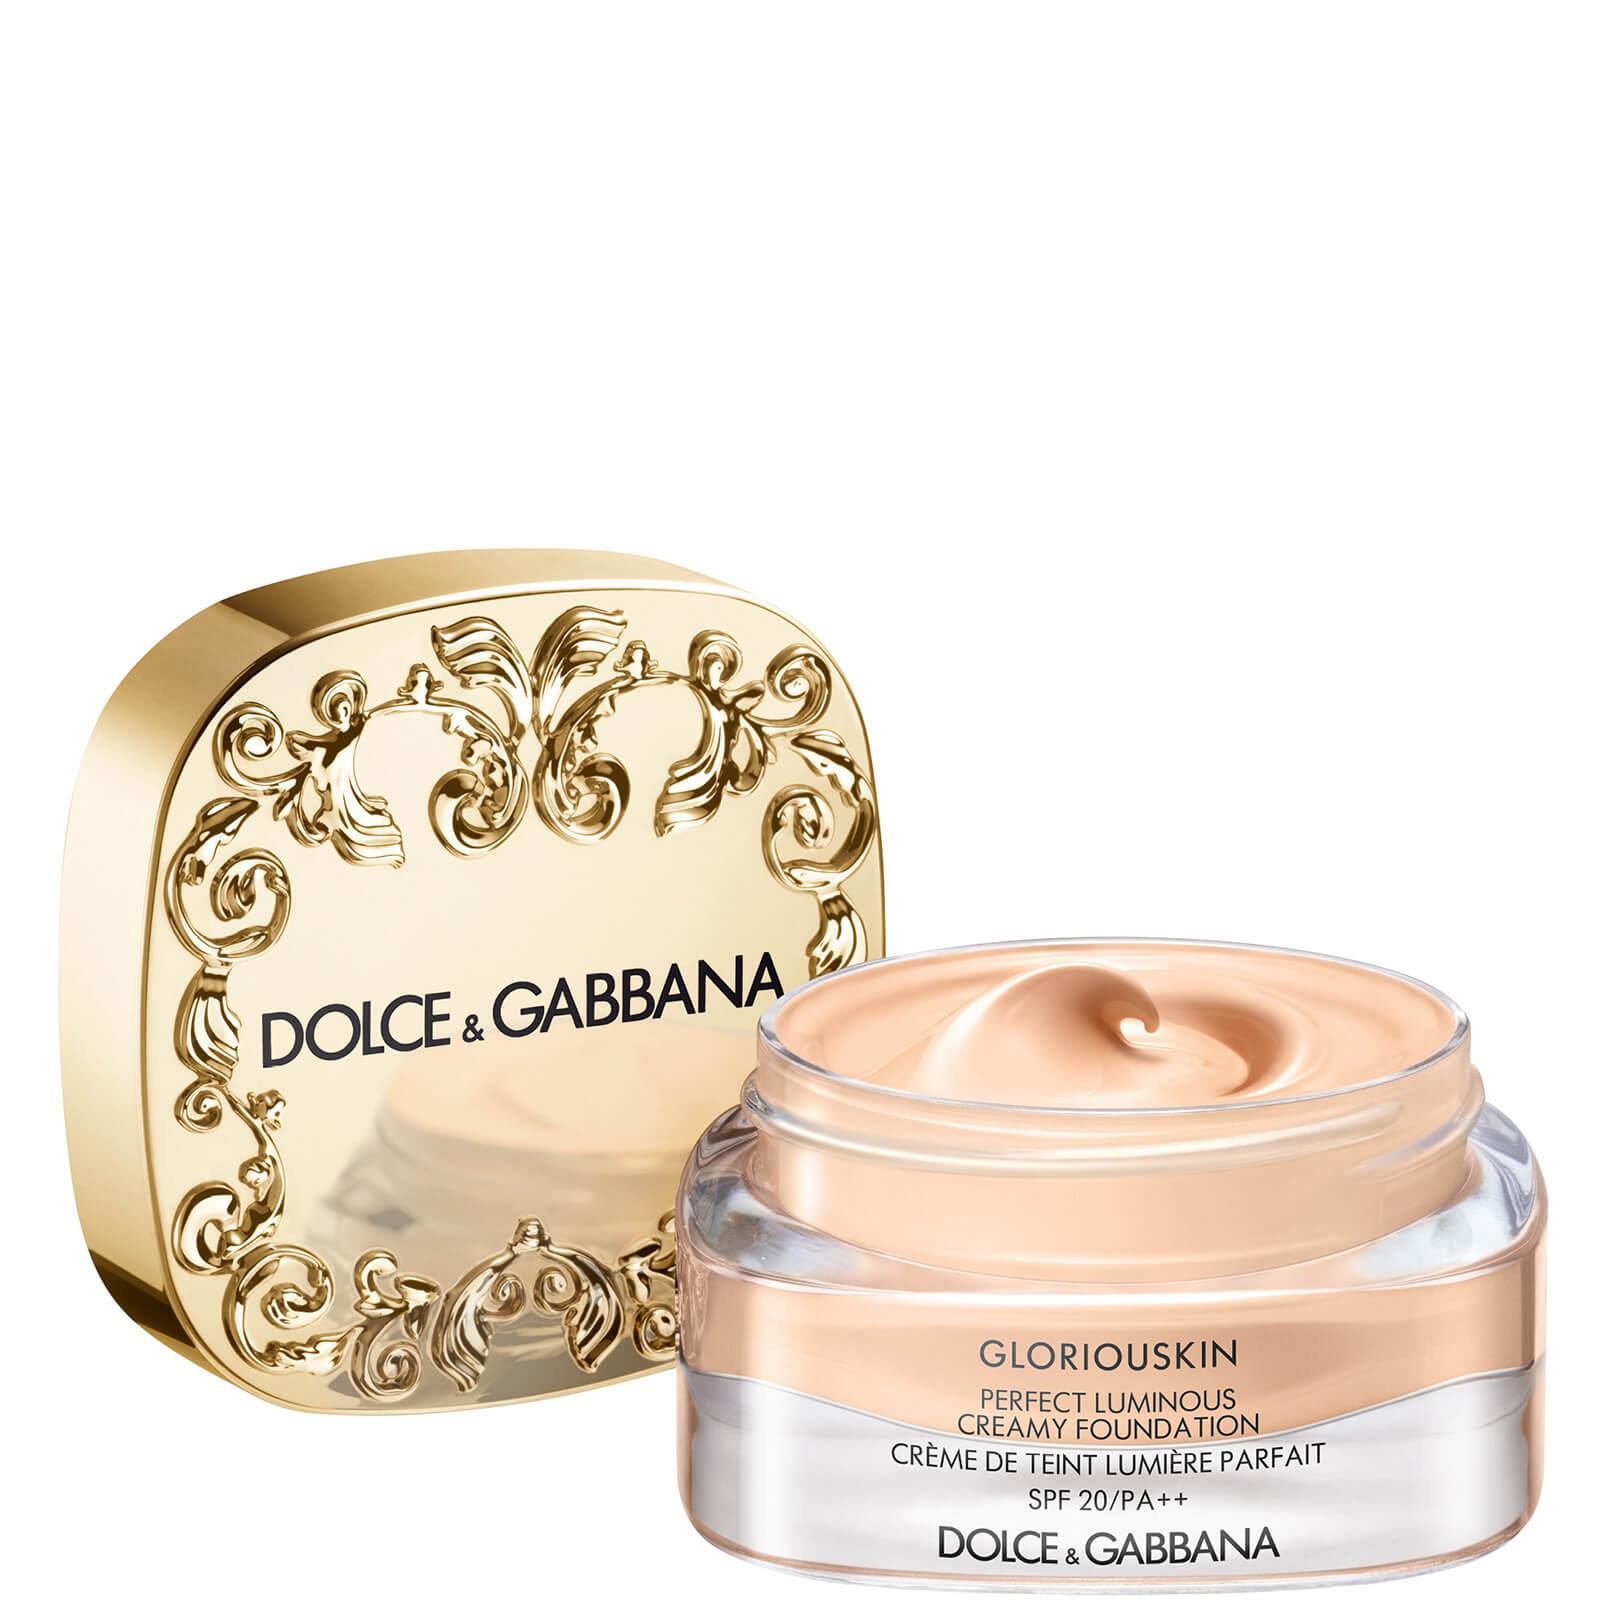 Dolce&Gabbana Gloriouskin Perfect Luminous Creamy Foundation 30ml (Various Shades) - Porcelain 100